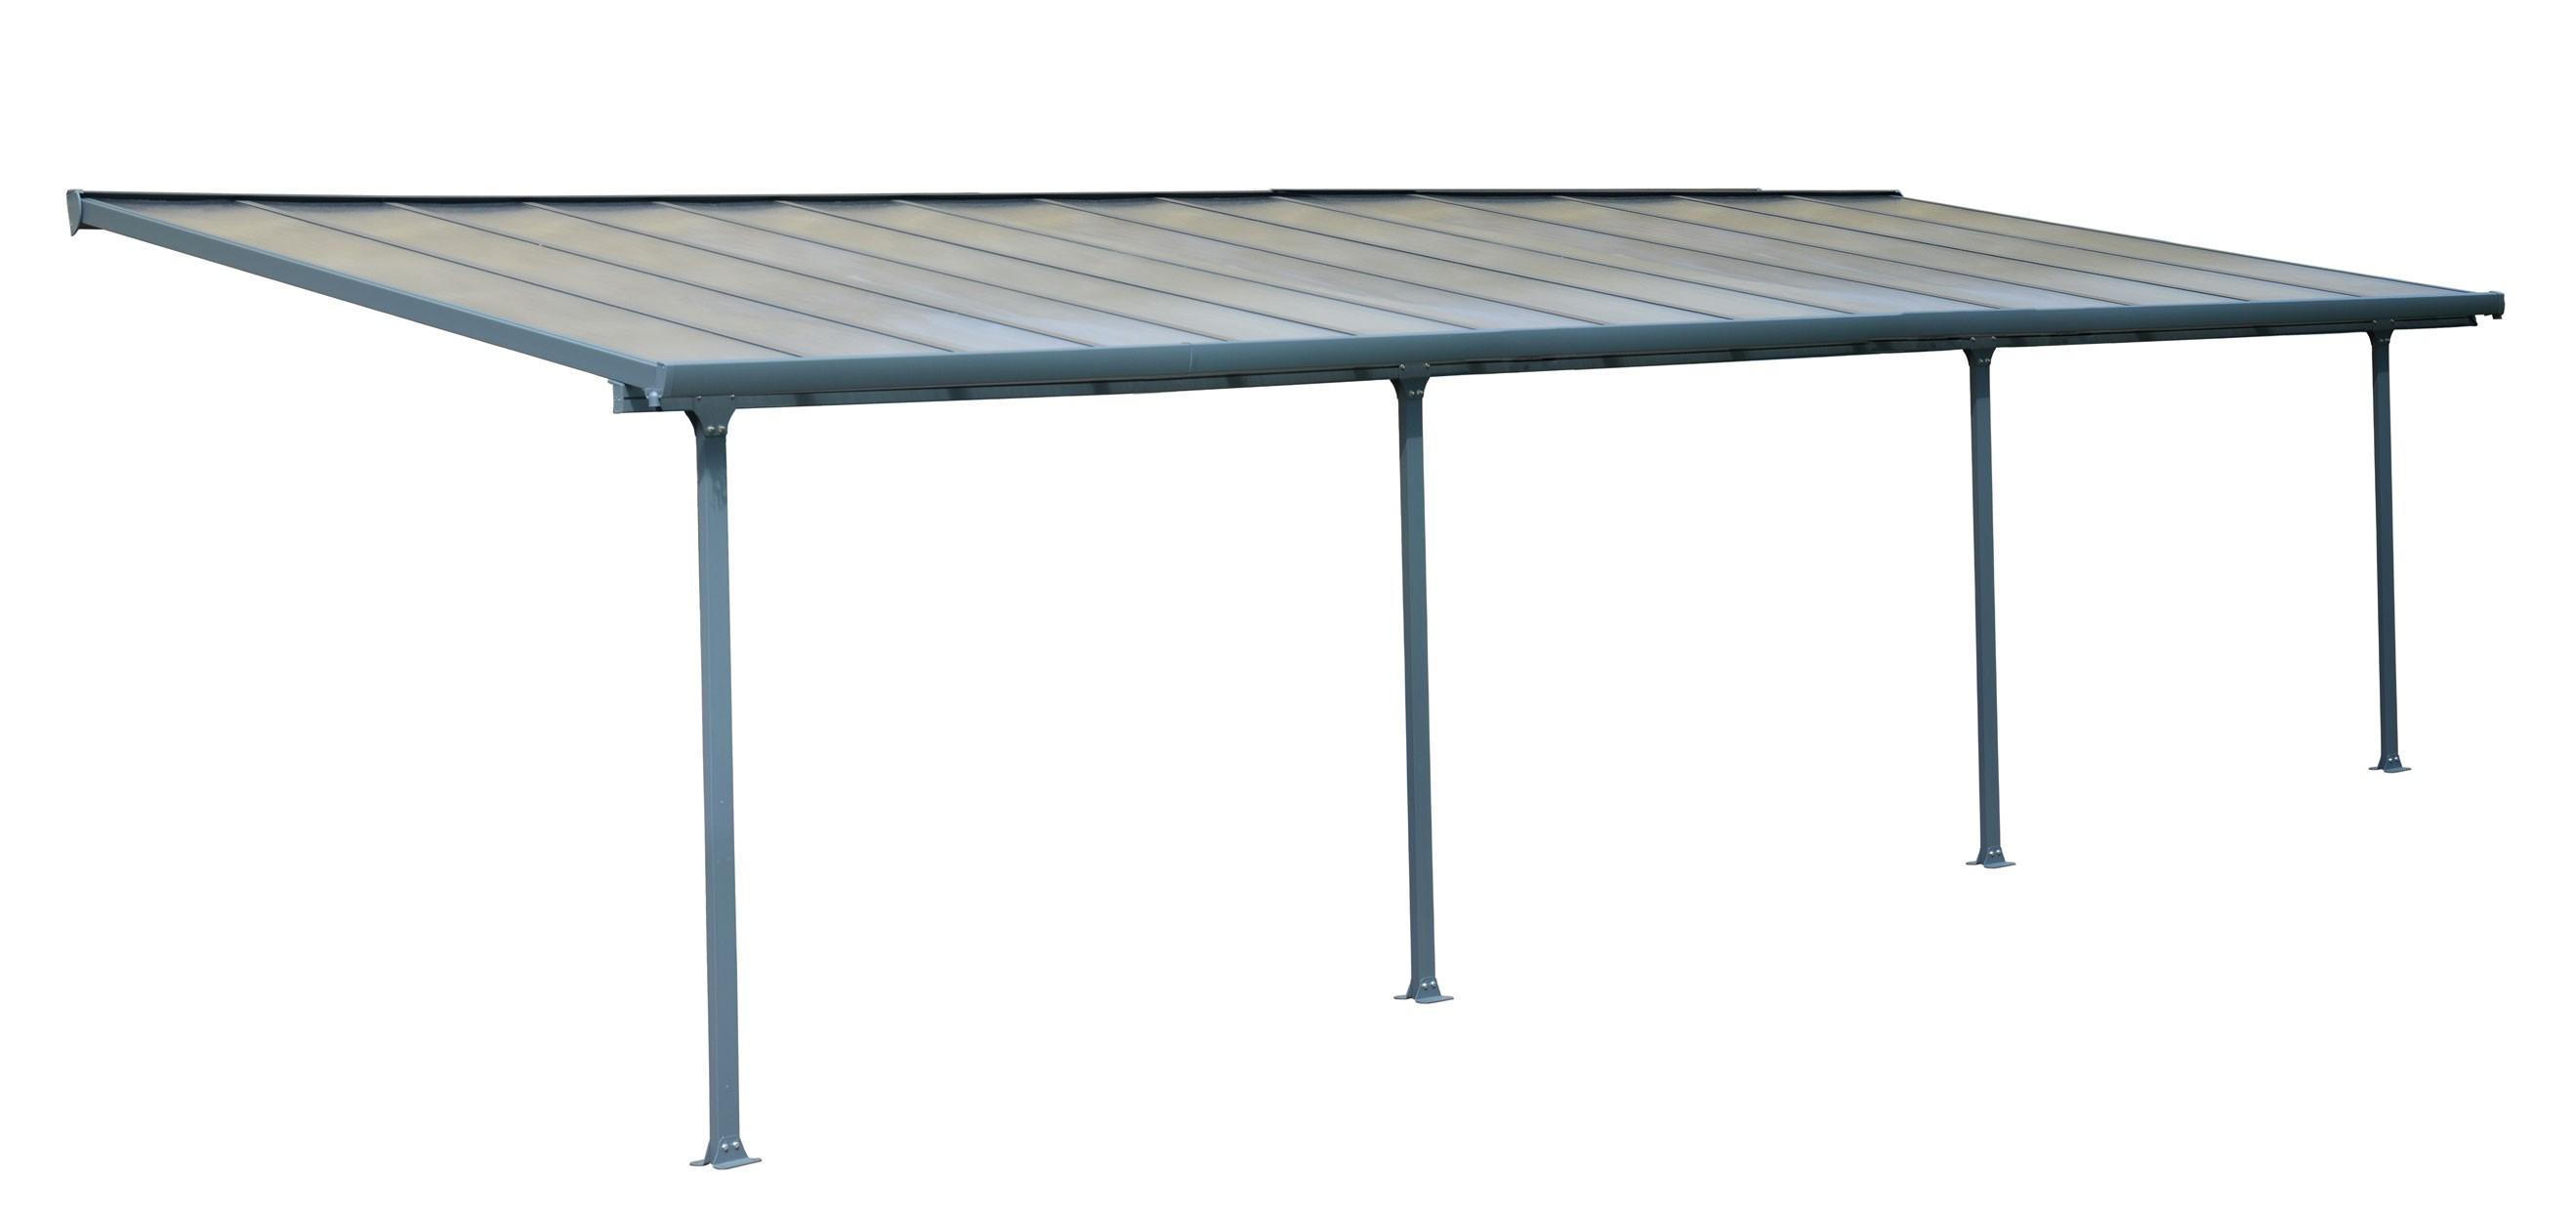 terrassen berdachung carport alu grau hohlkammerplatten 851x295cm bei. Black Bedroom Furniture Sets. Home Design Ideas